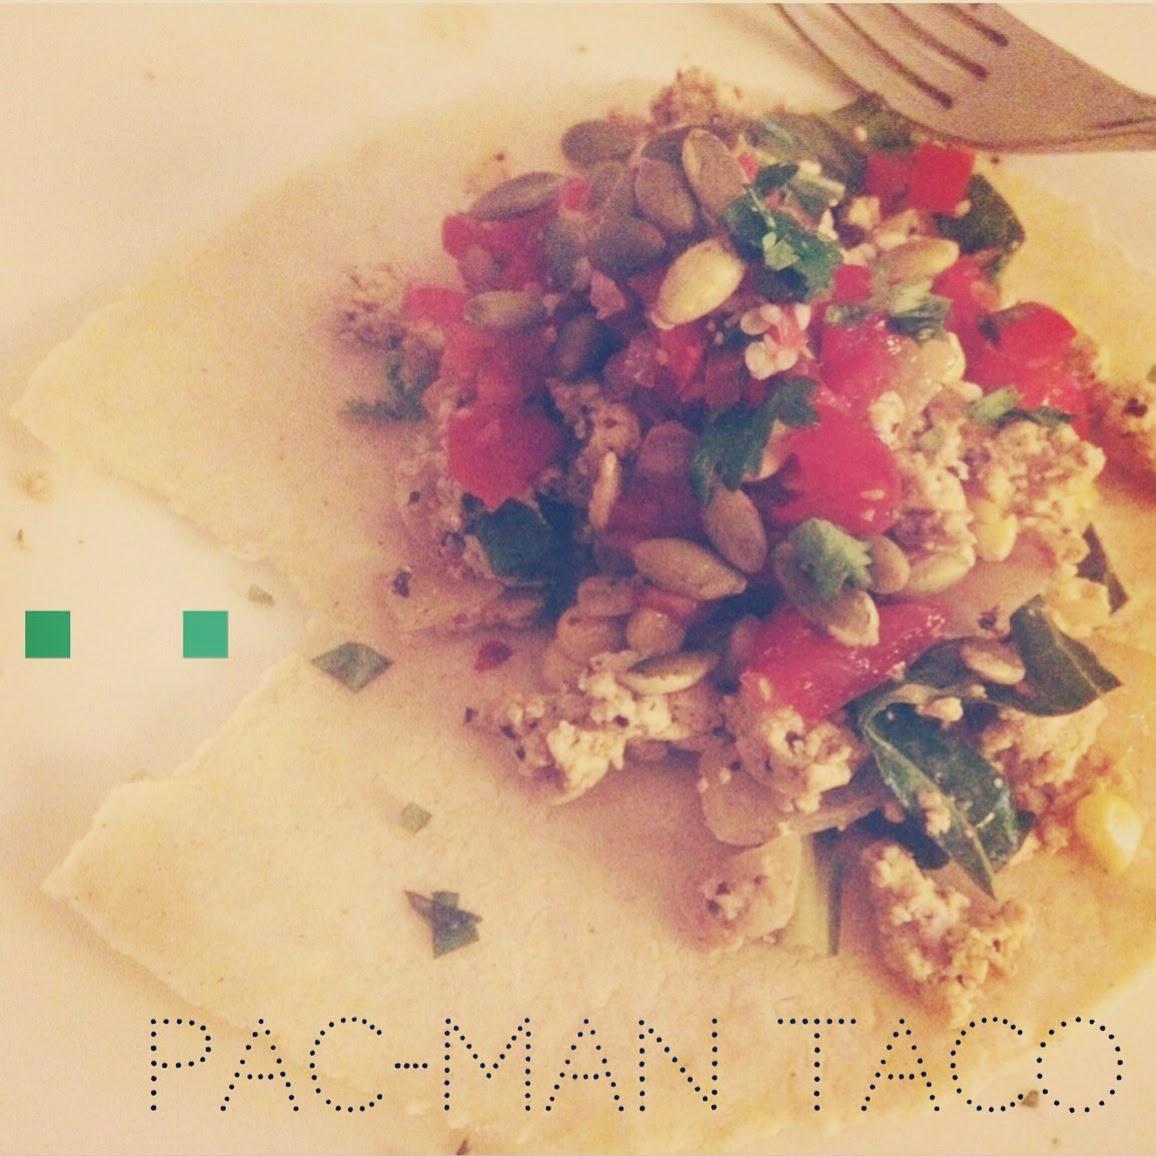 gluten free vegan breakfast tacos, Vegan MoFo